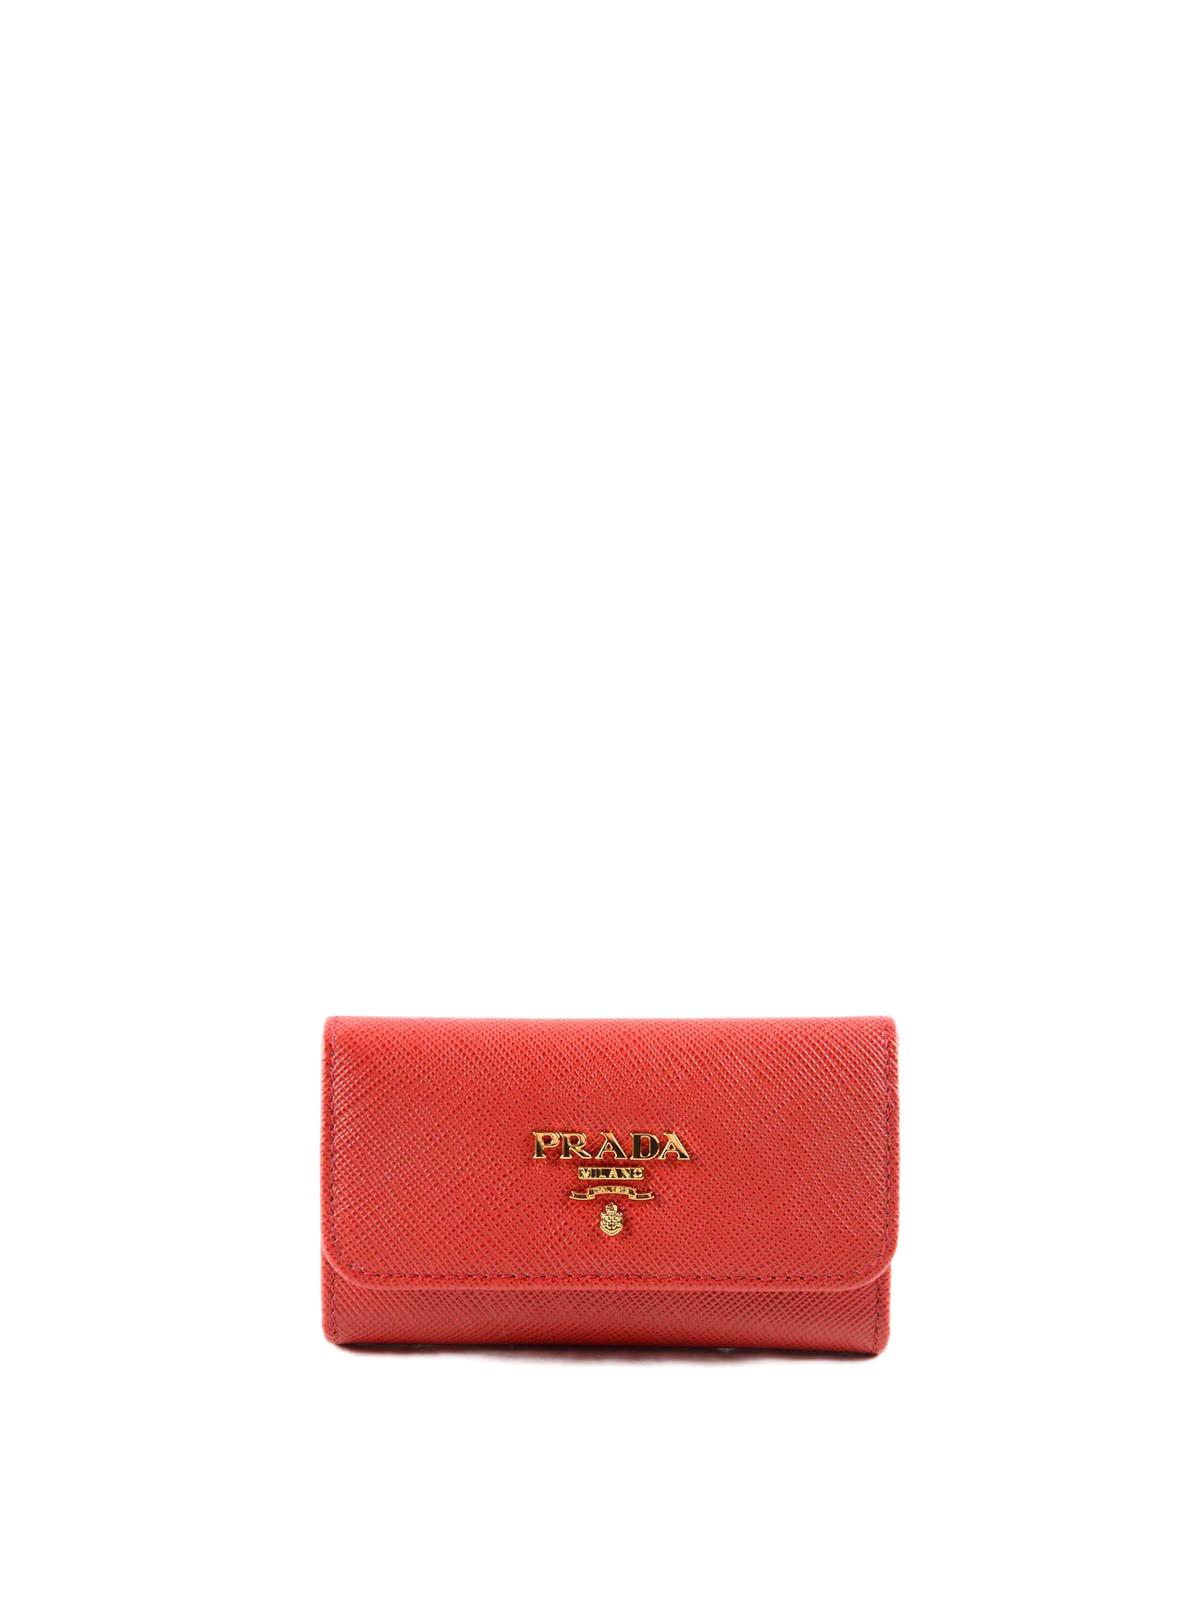 2d0f548cdbe4 Prada - Saffiano leather key holder - key holders - 1PG222 QWA 011